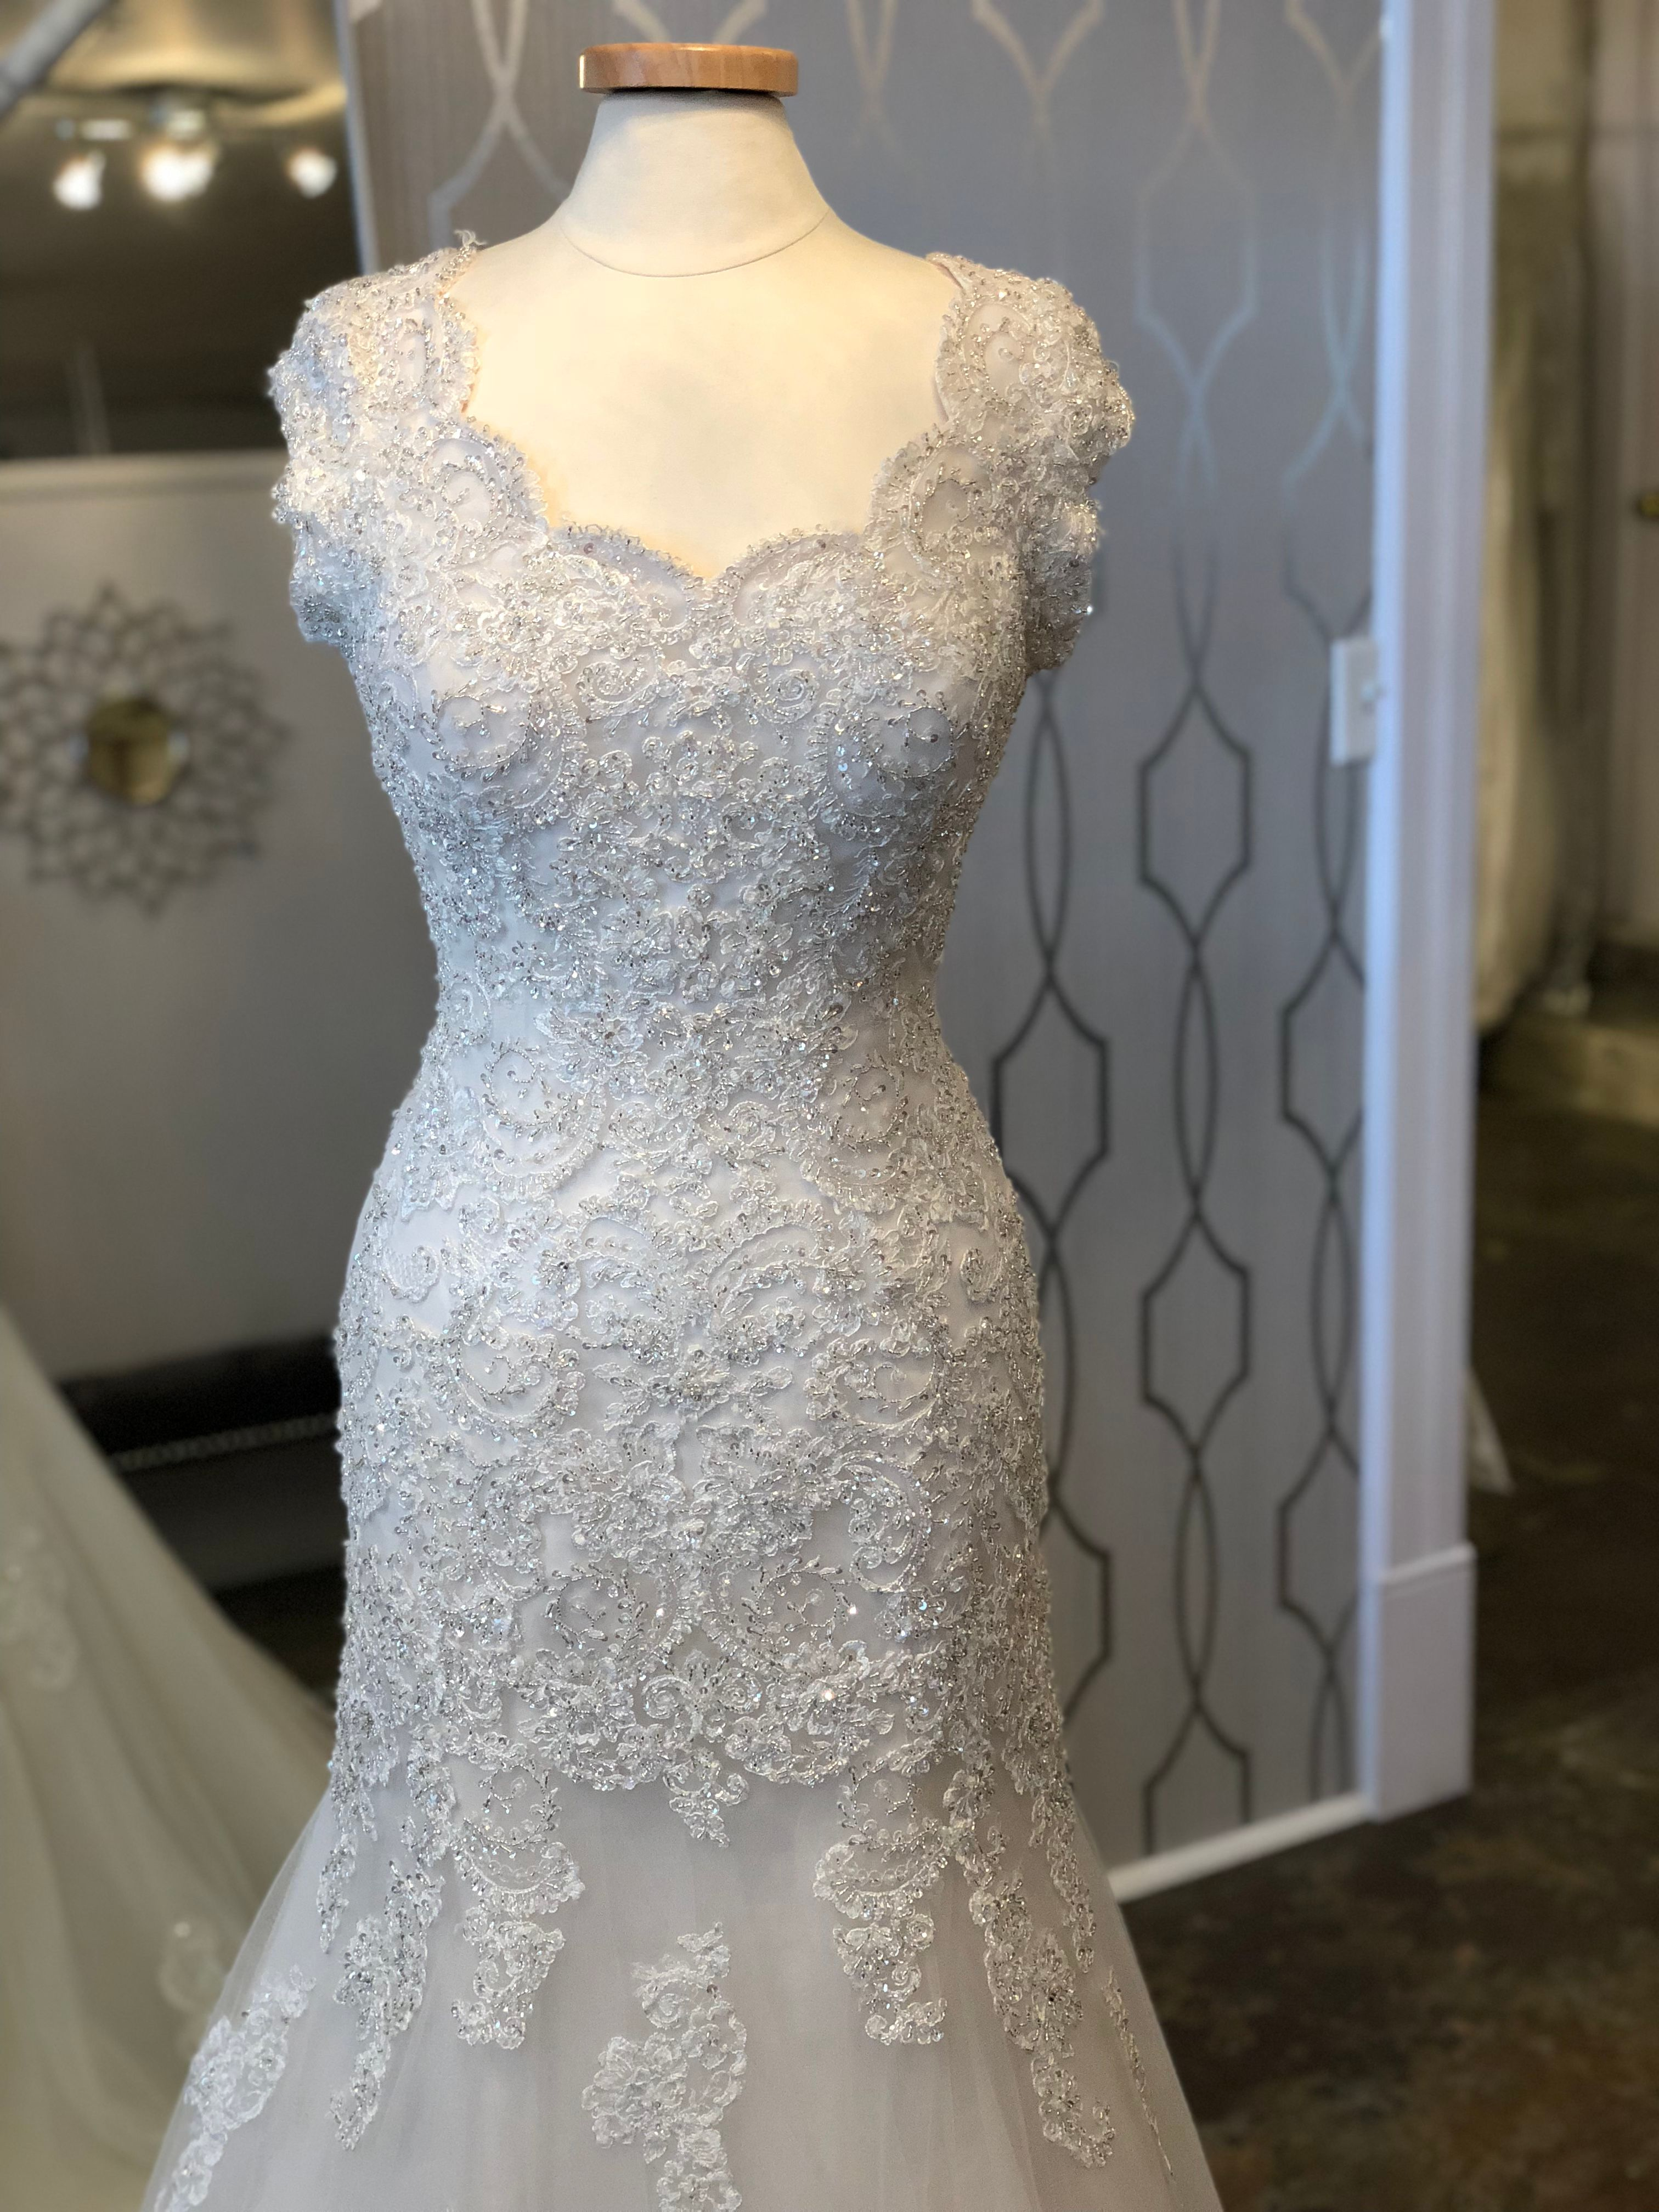 Affordable Designer Wedding Dresses Wedding Dresses Designer Wedding Dresses Dresses,Lace Vintage Style Plus Size Wedding Dresses